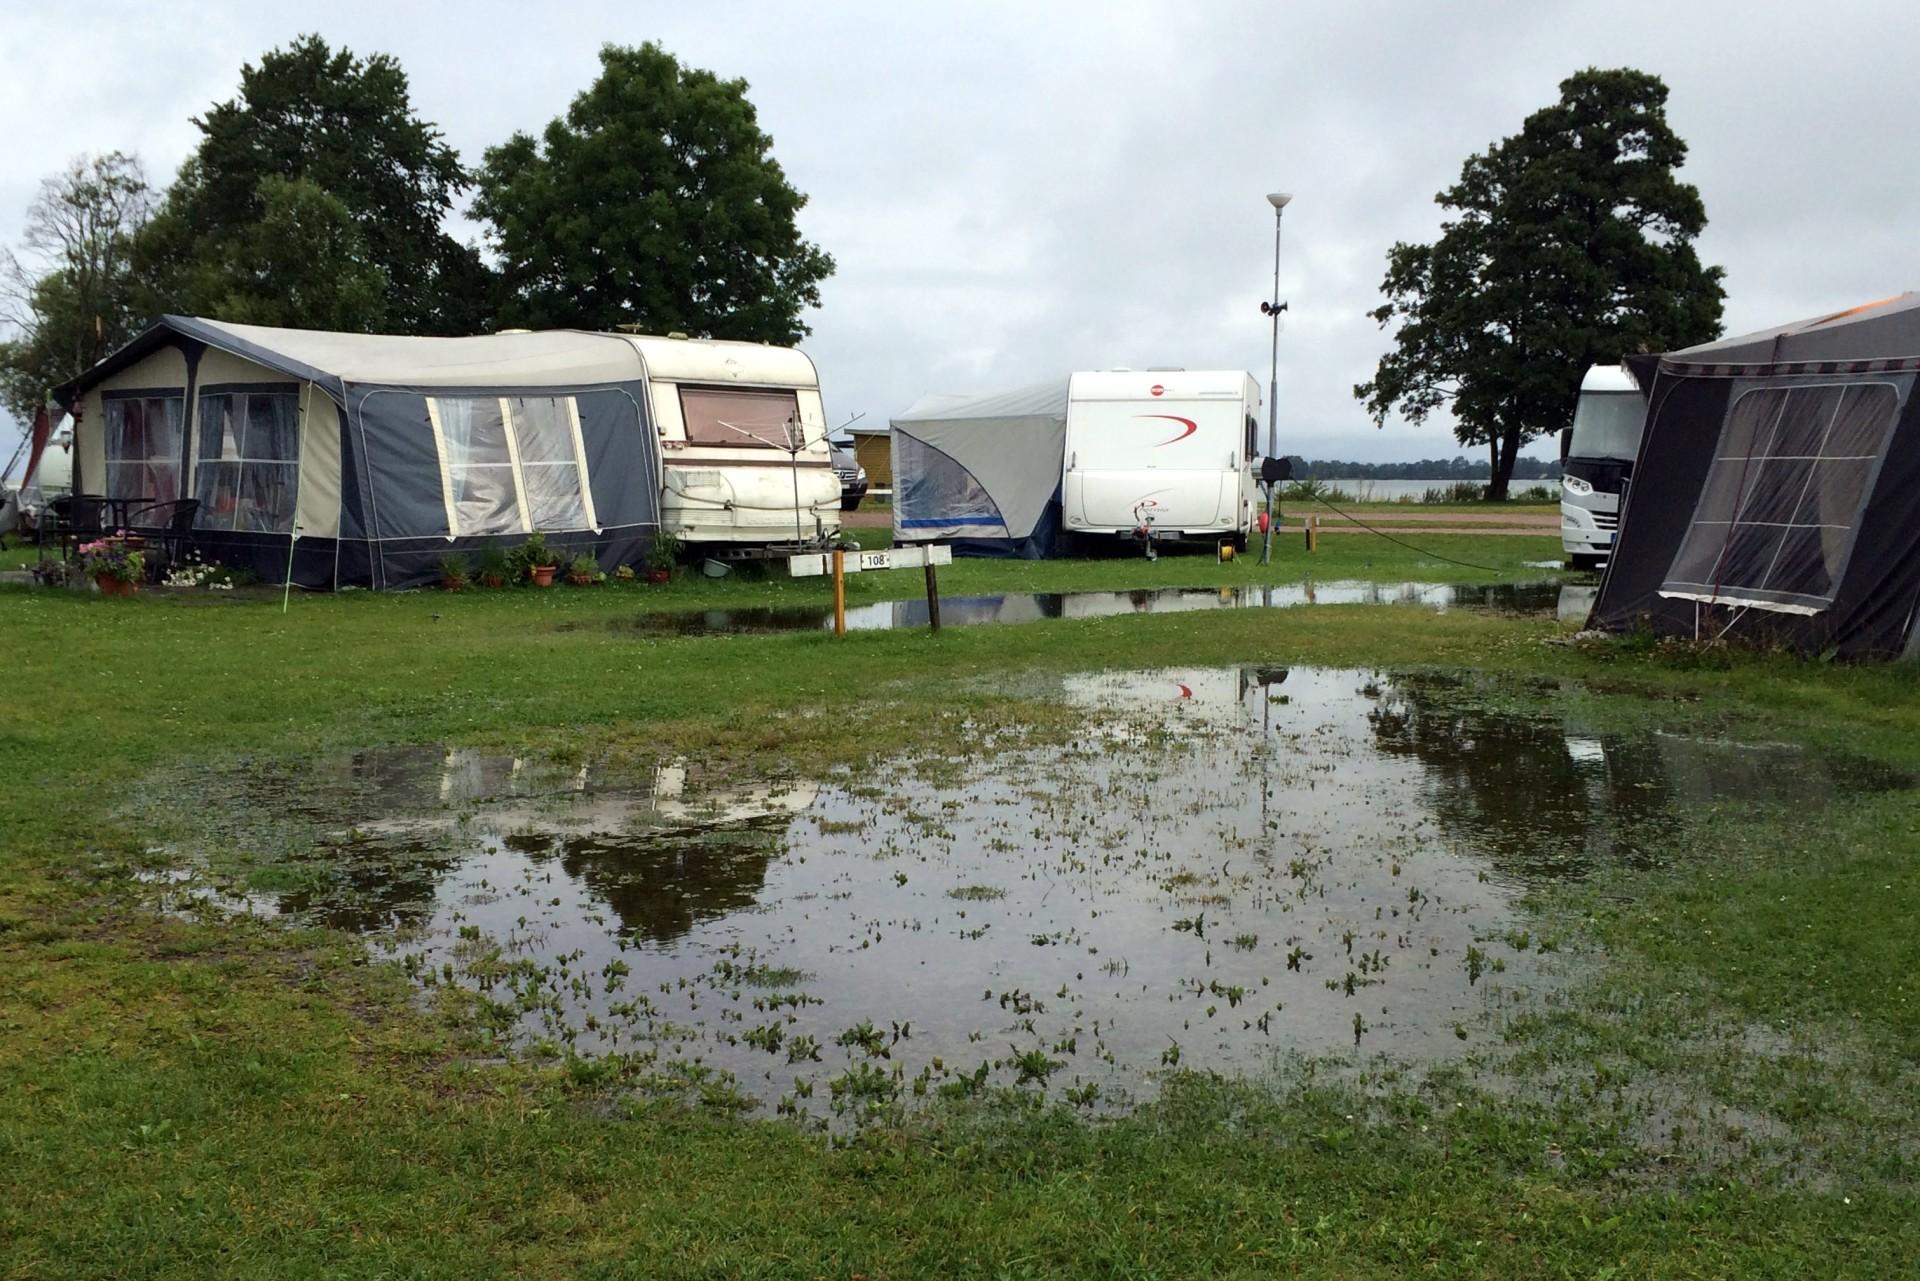 Faltcaravan-Abbau bei Regen